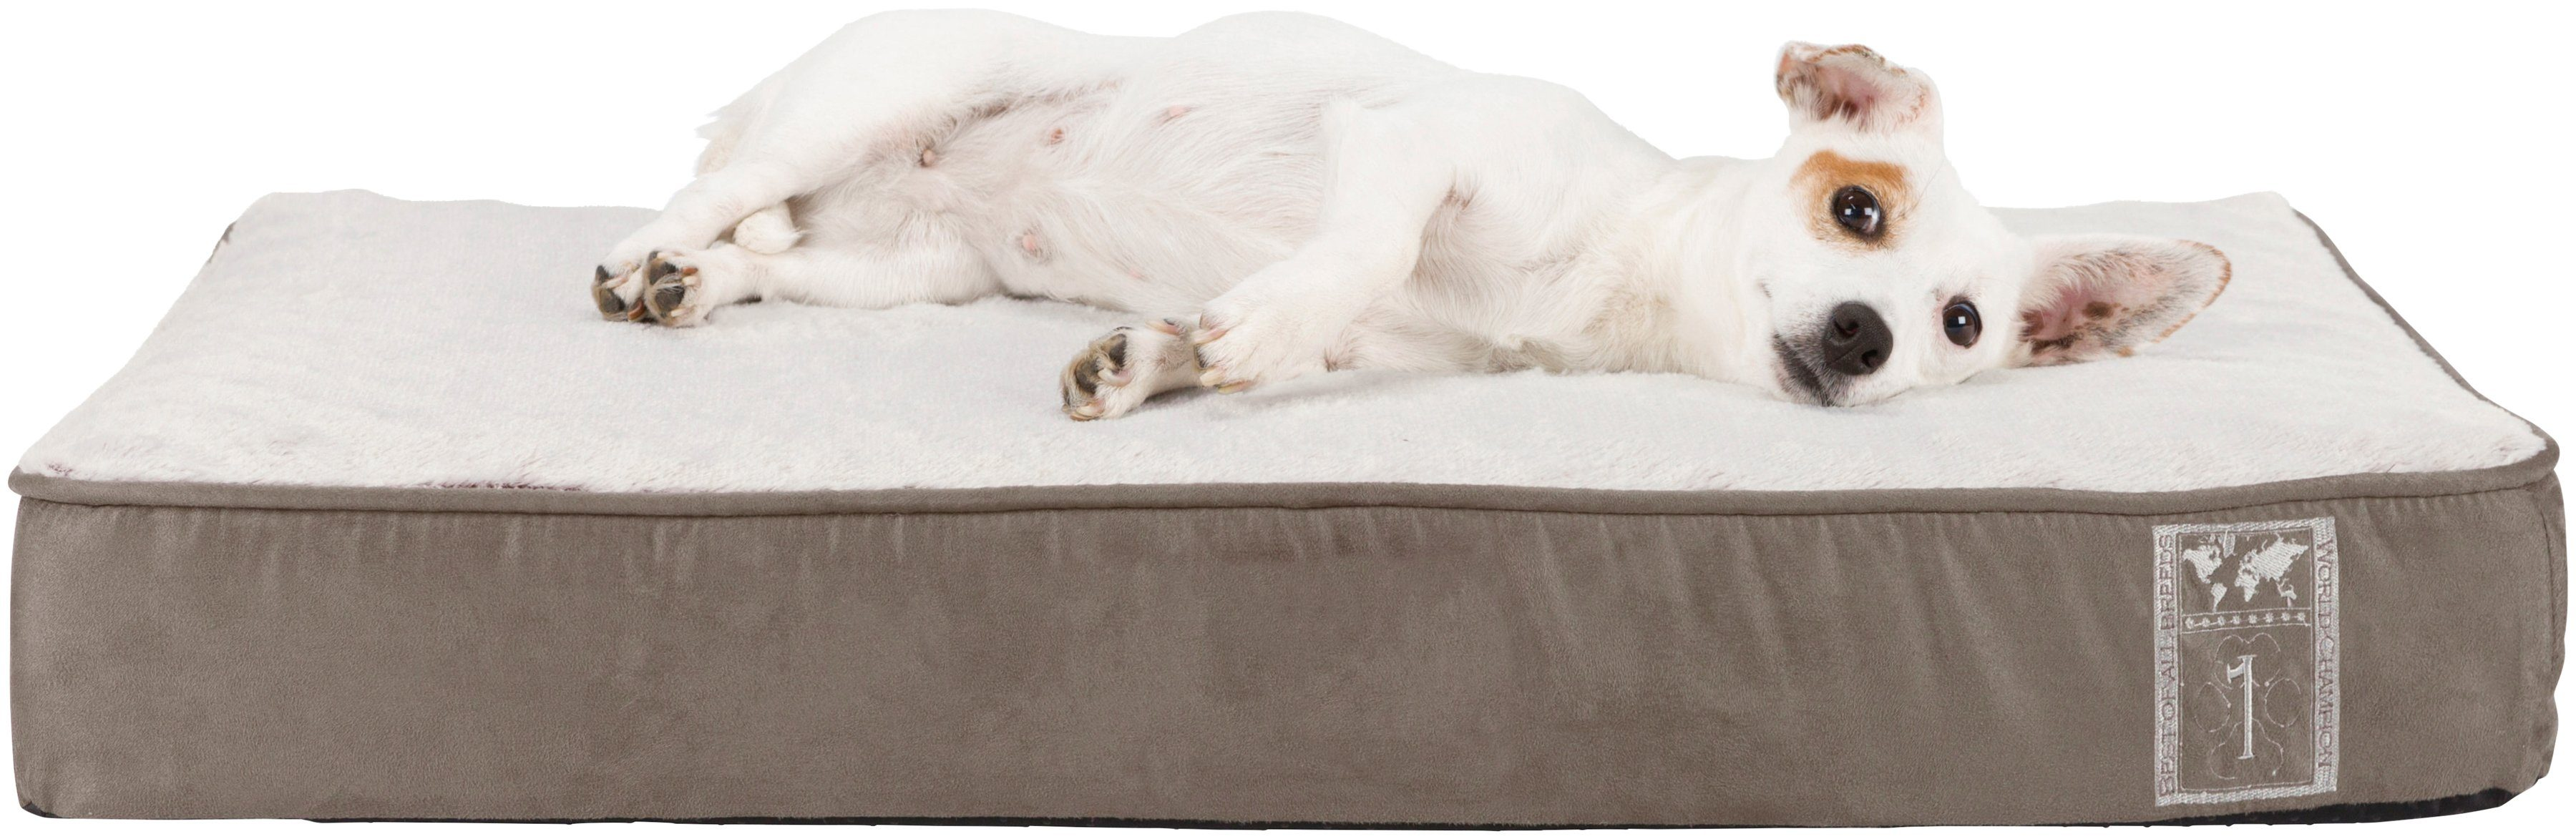 TRIXIE Hunde-Bett »Vital Best of all Breeds«, BxL: 60x40 cm